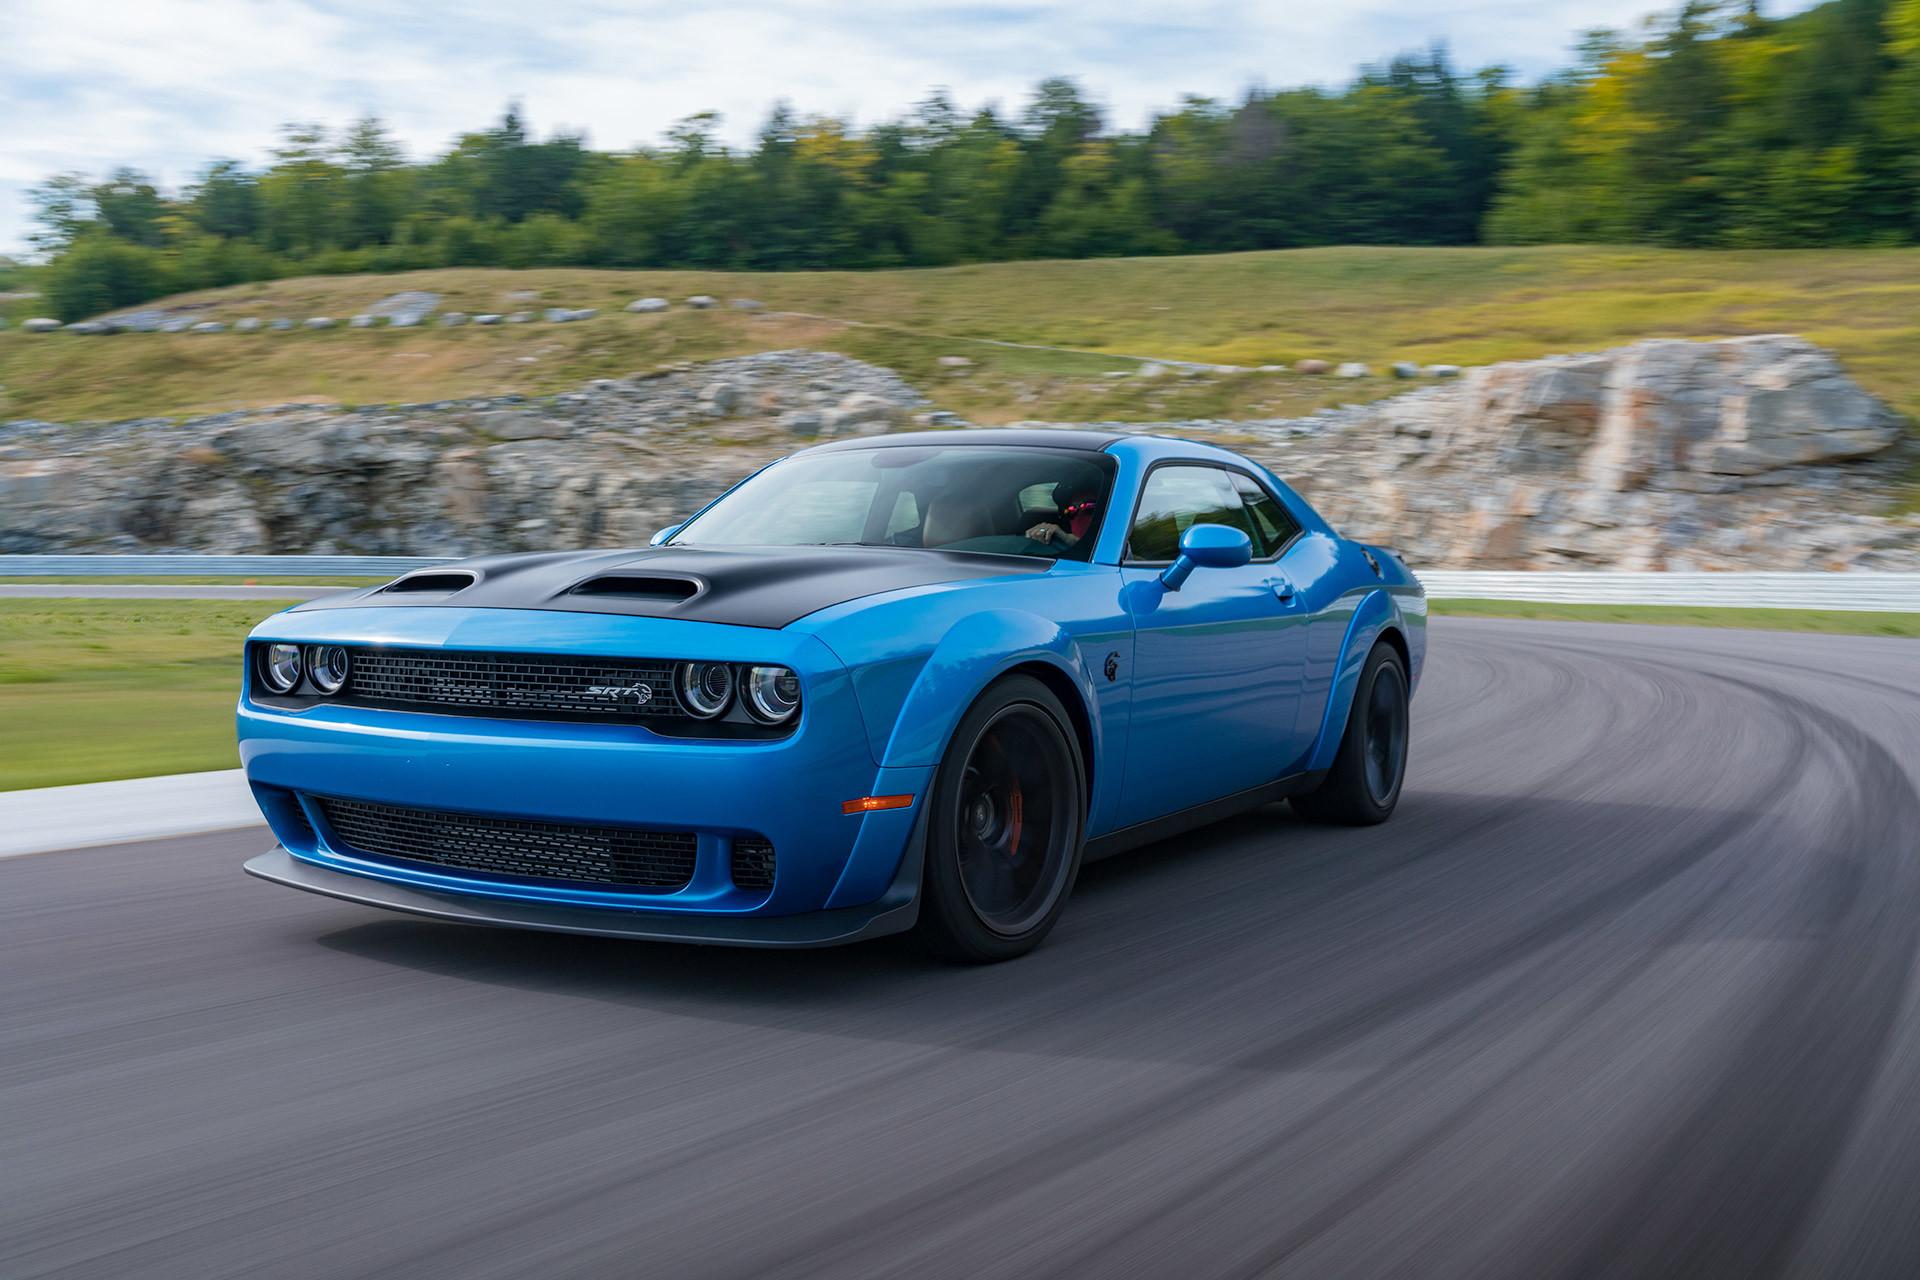 2019 Dodge Challenger | Dodge Canada